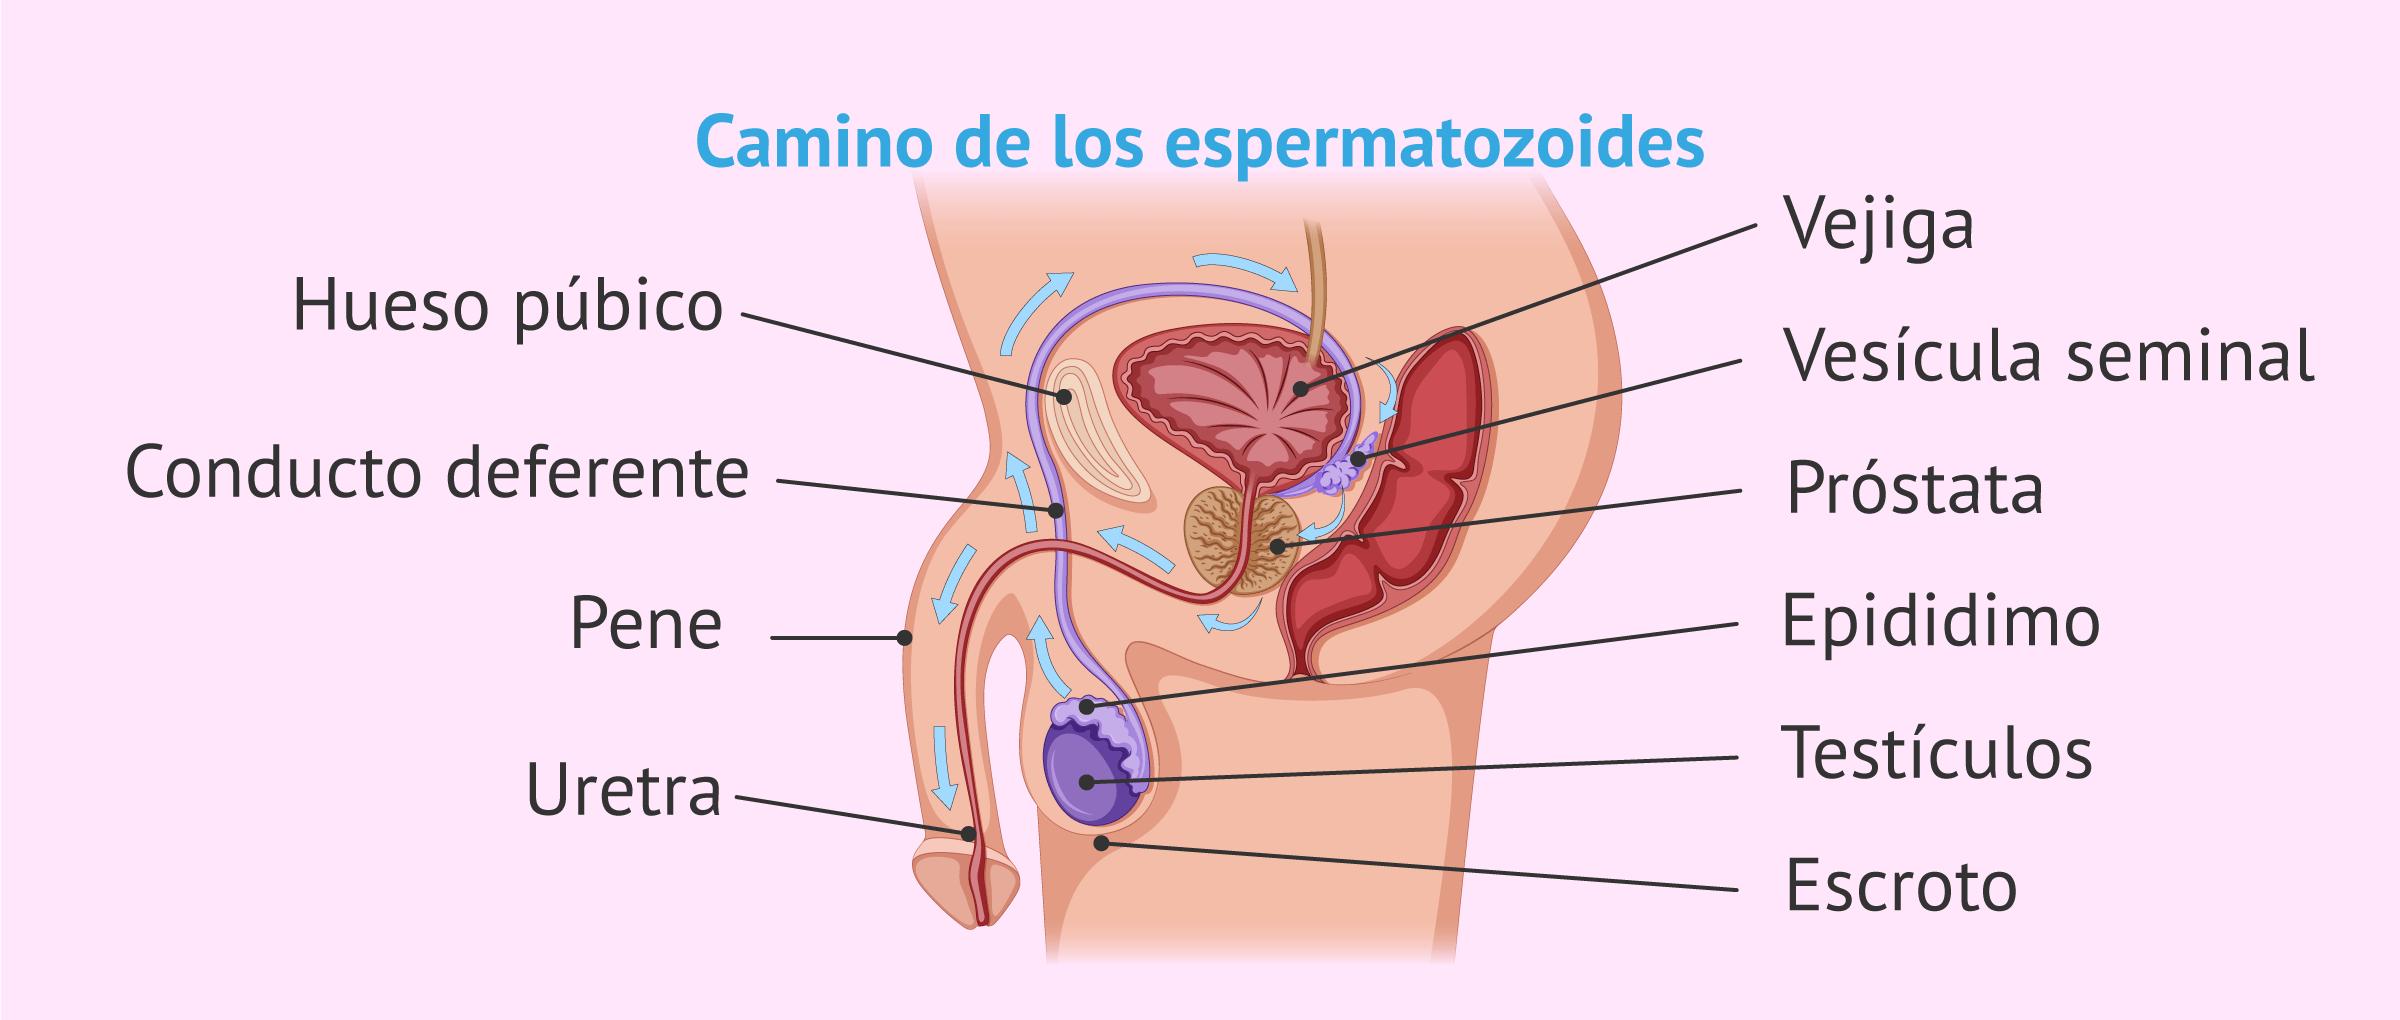 sistema-reproductor-masculino.jpg